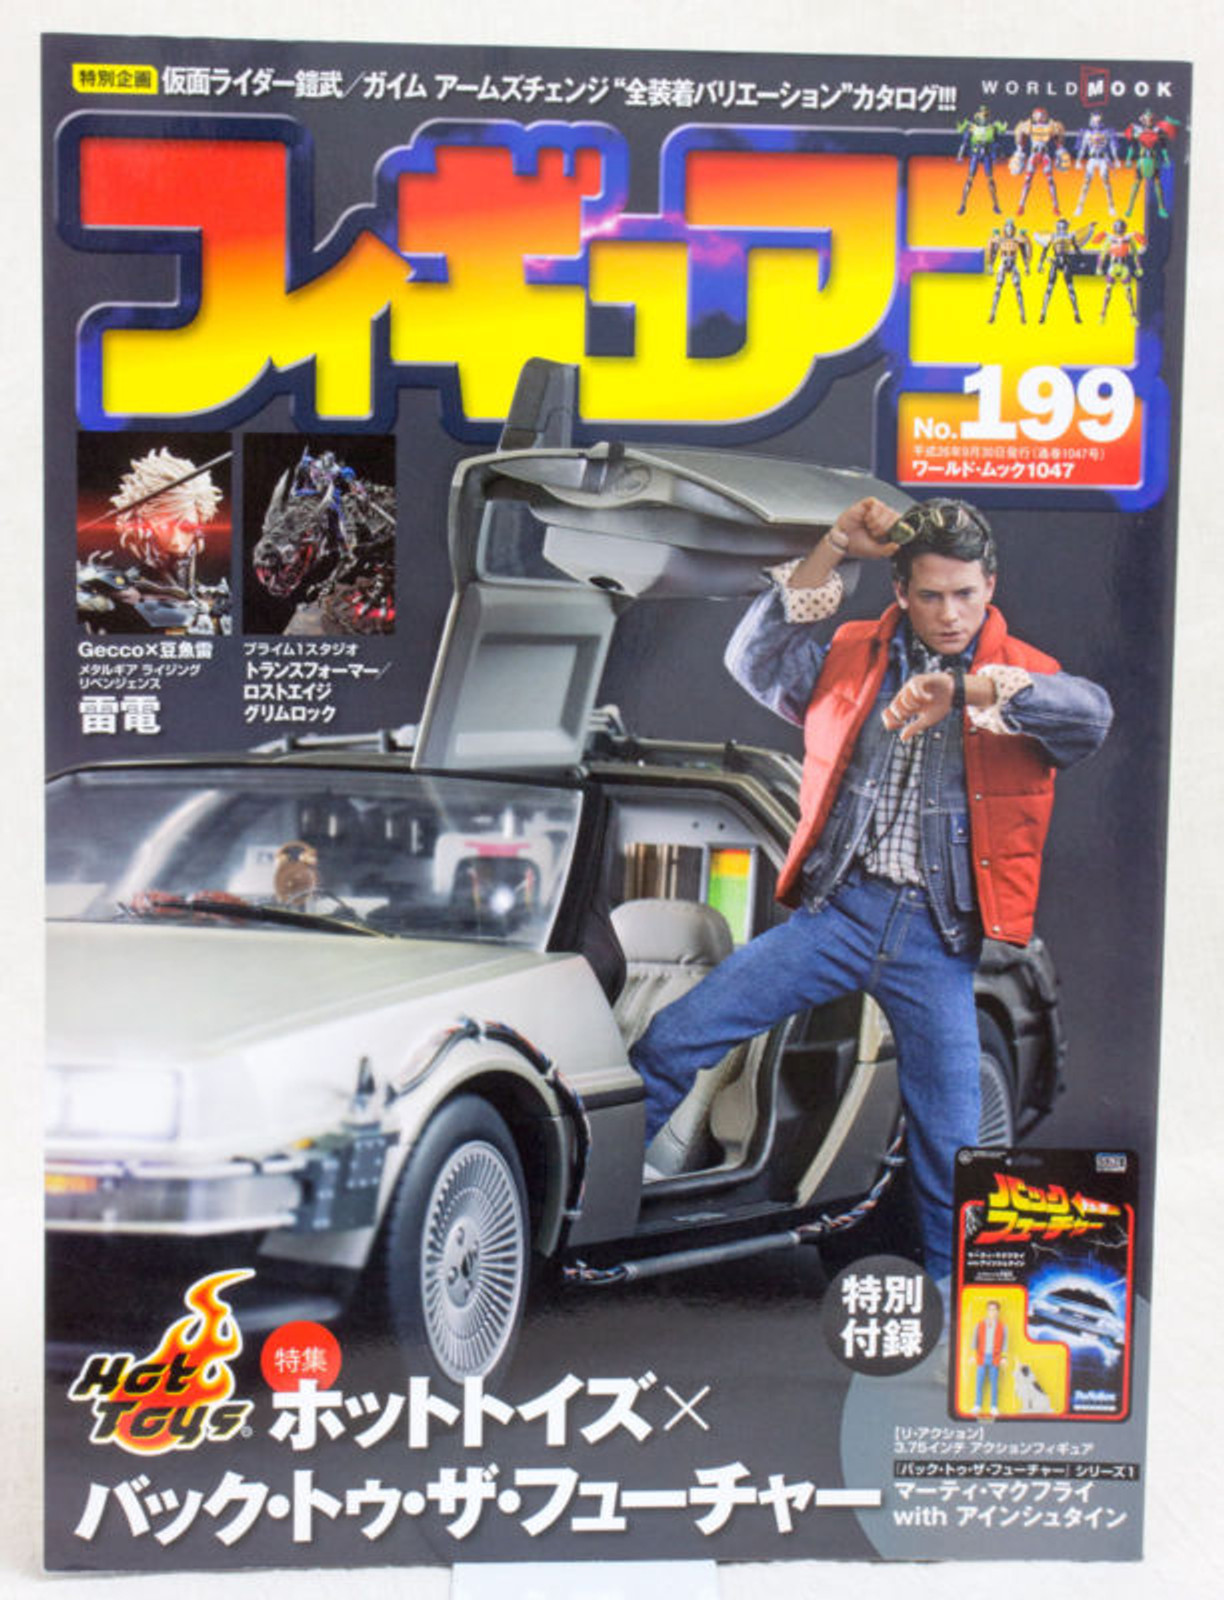 FIGURE OU #199 Anime Toy Japanese Magazine Book Feat. Hot Toys JAPAN